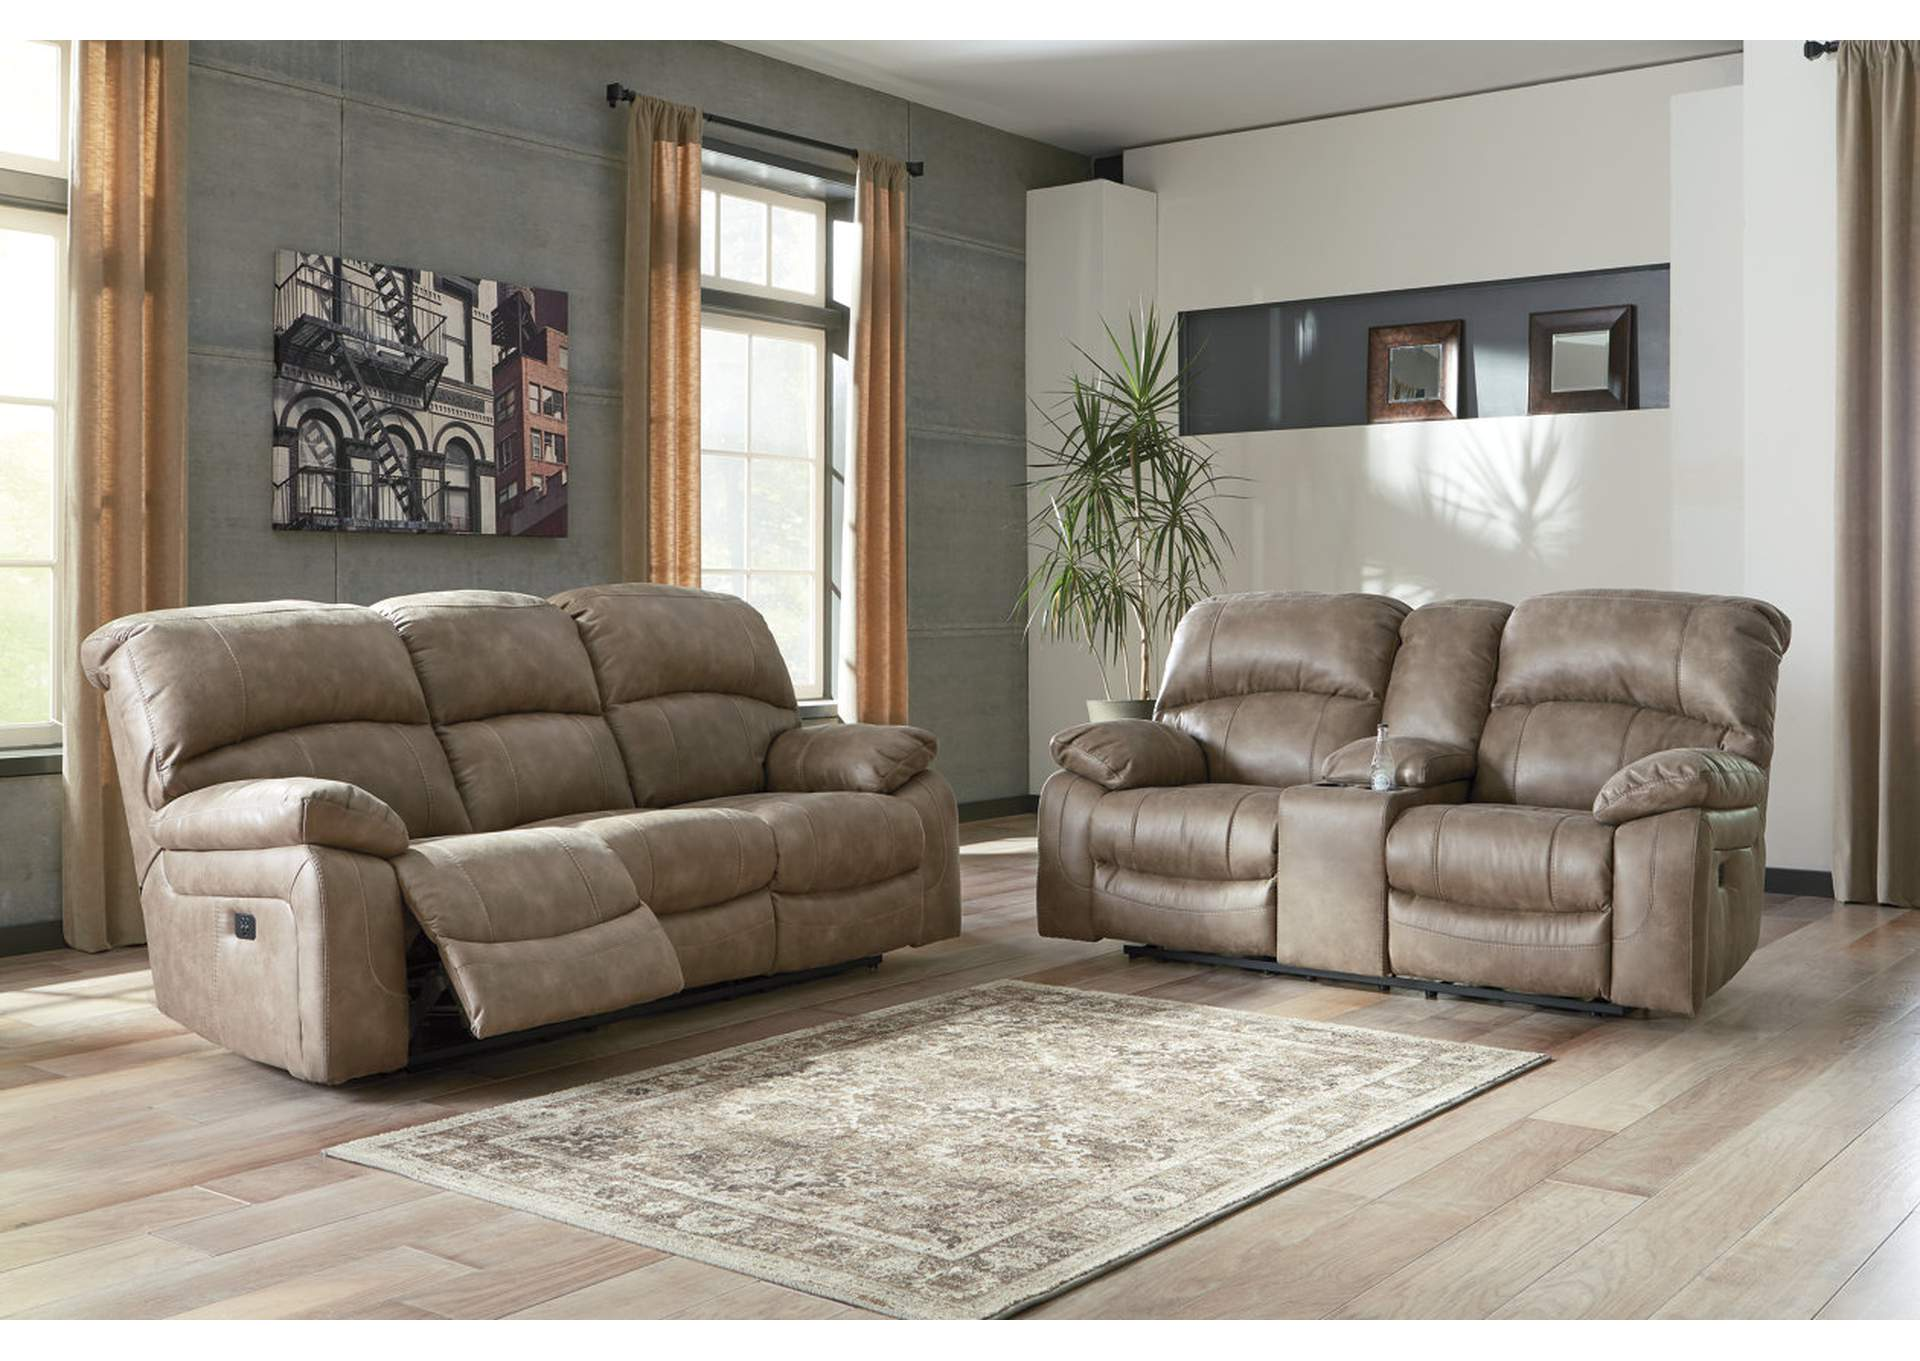 jillian s furniture